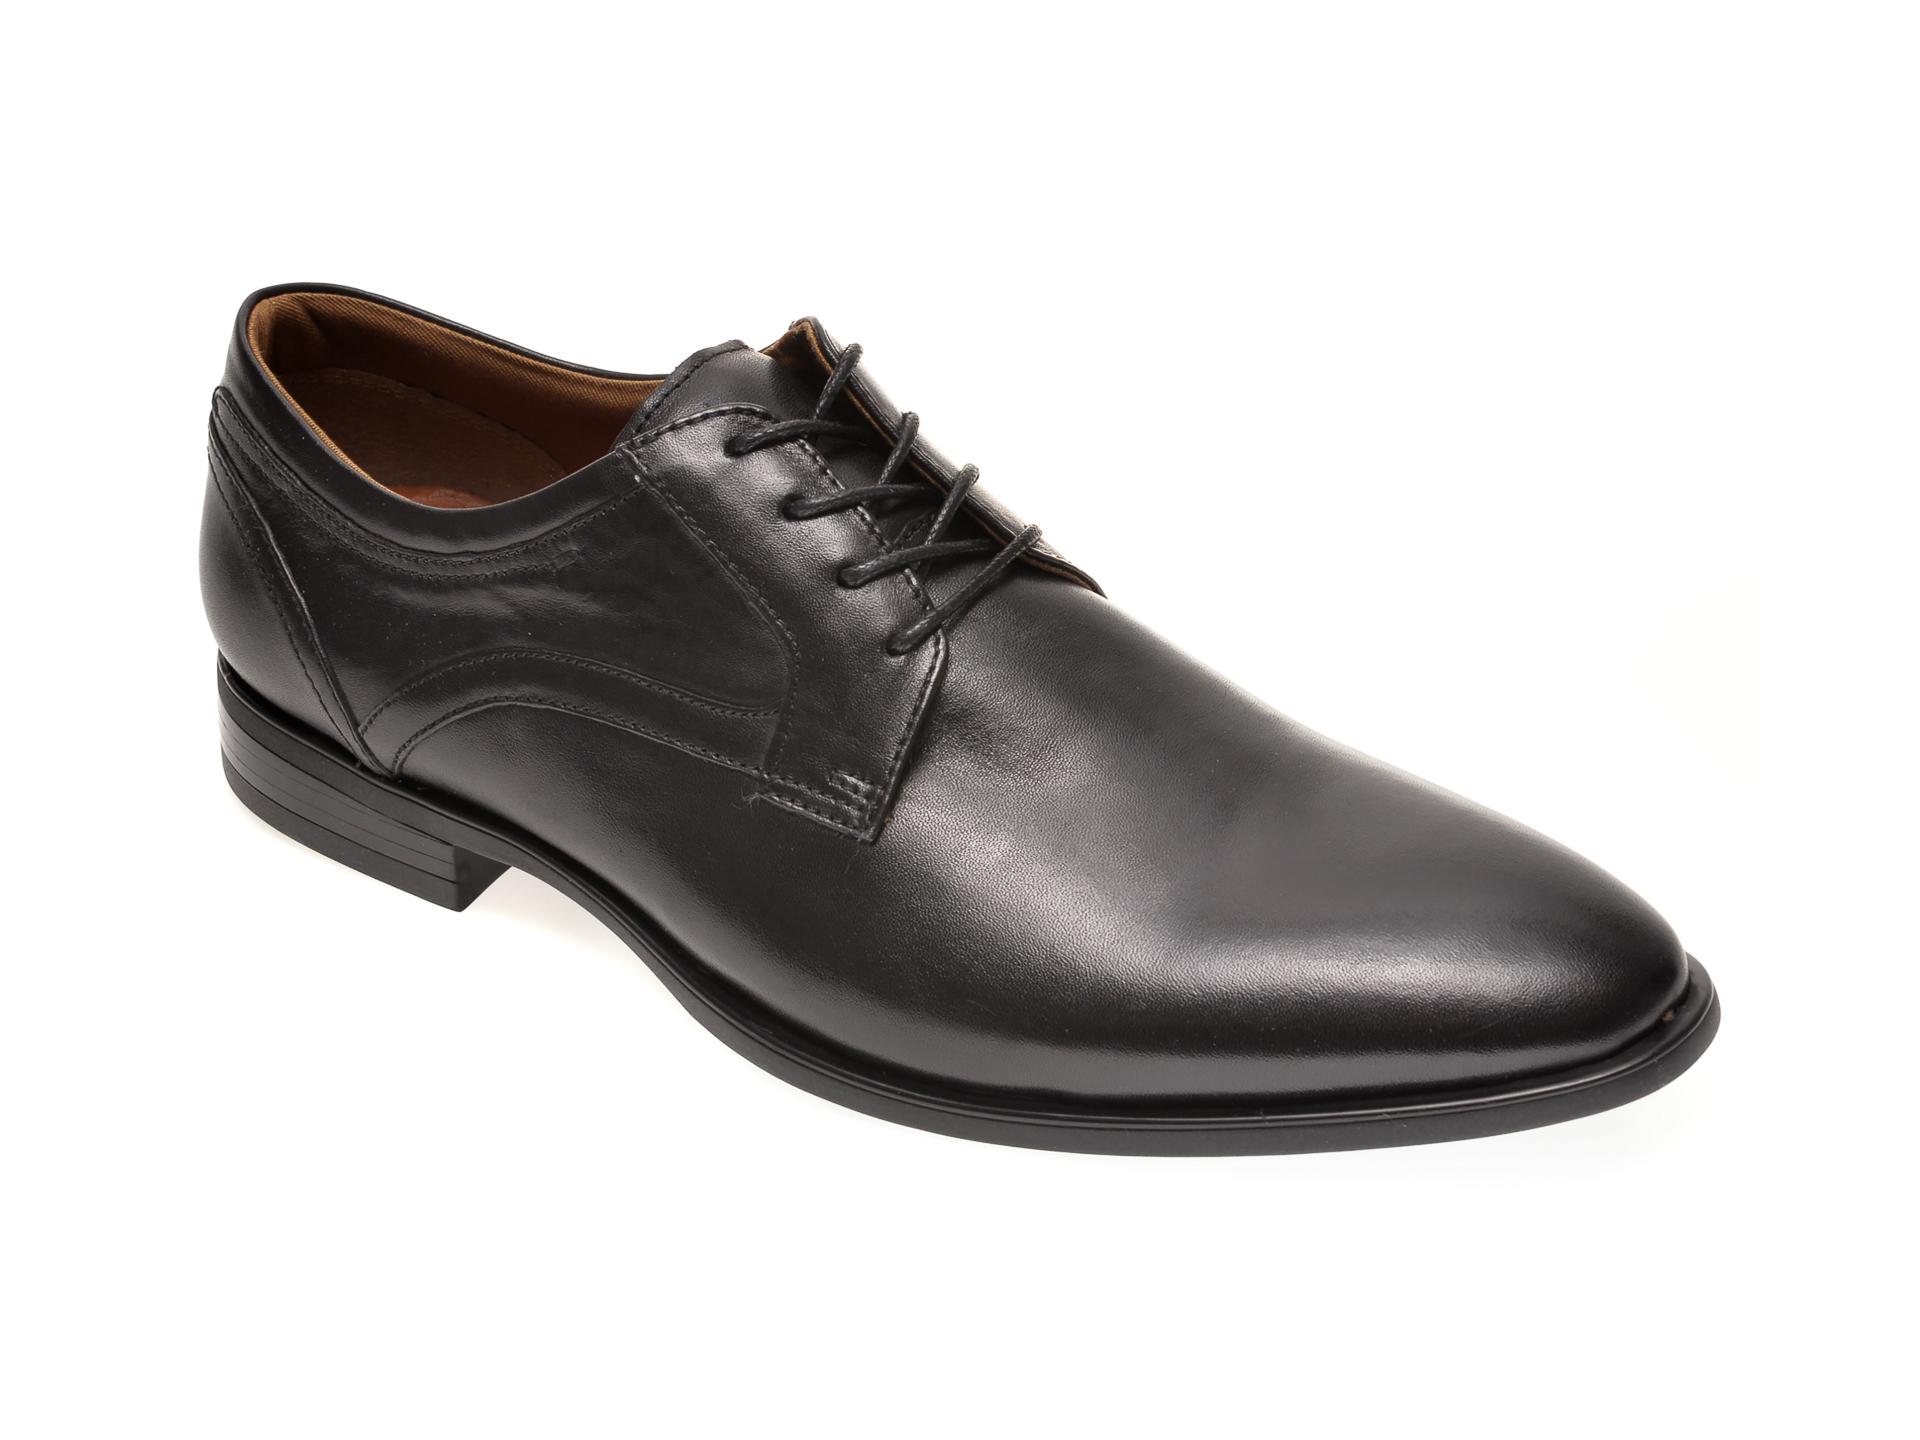 Pantofi ALDO negri, Erareven001, din piele naturala imagine otter.ro 2021